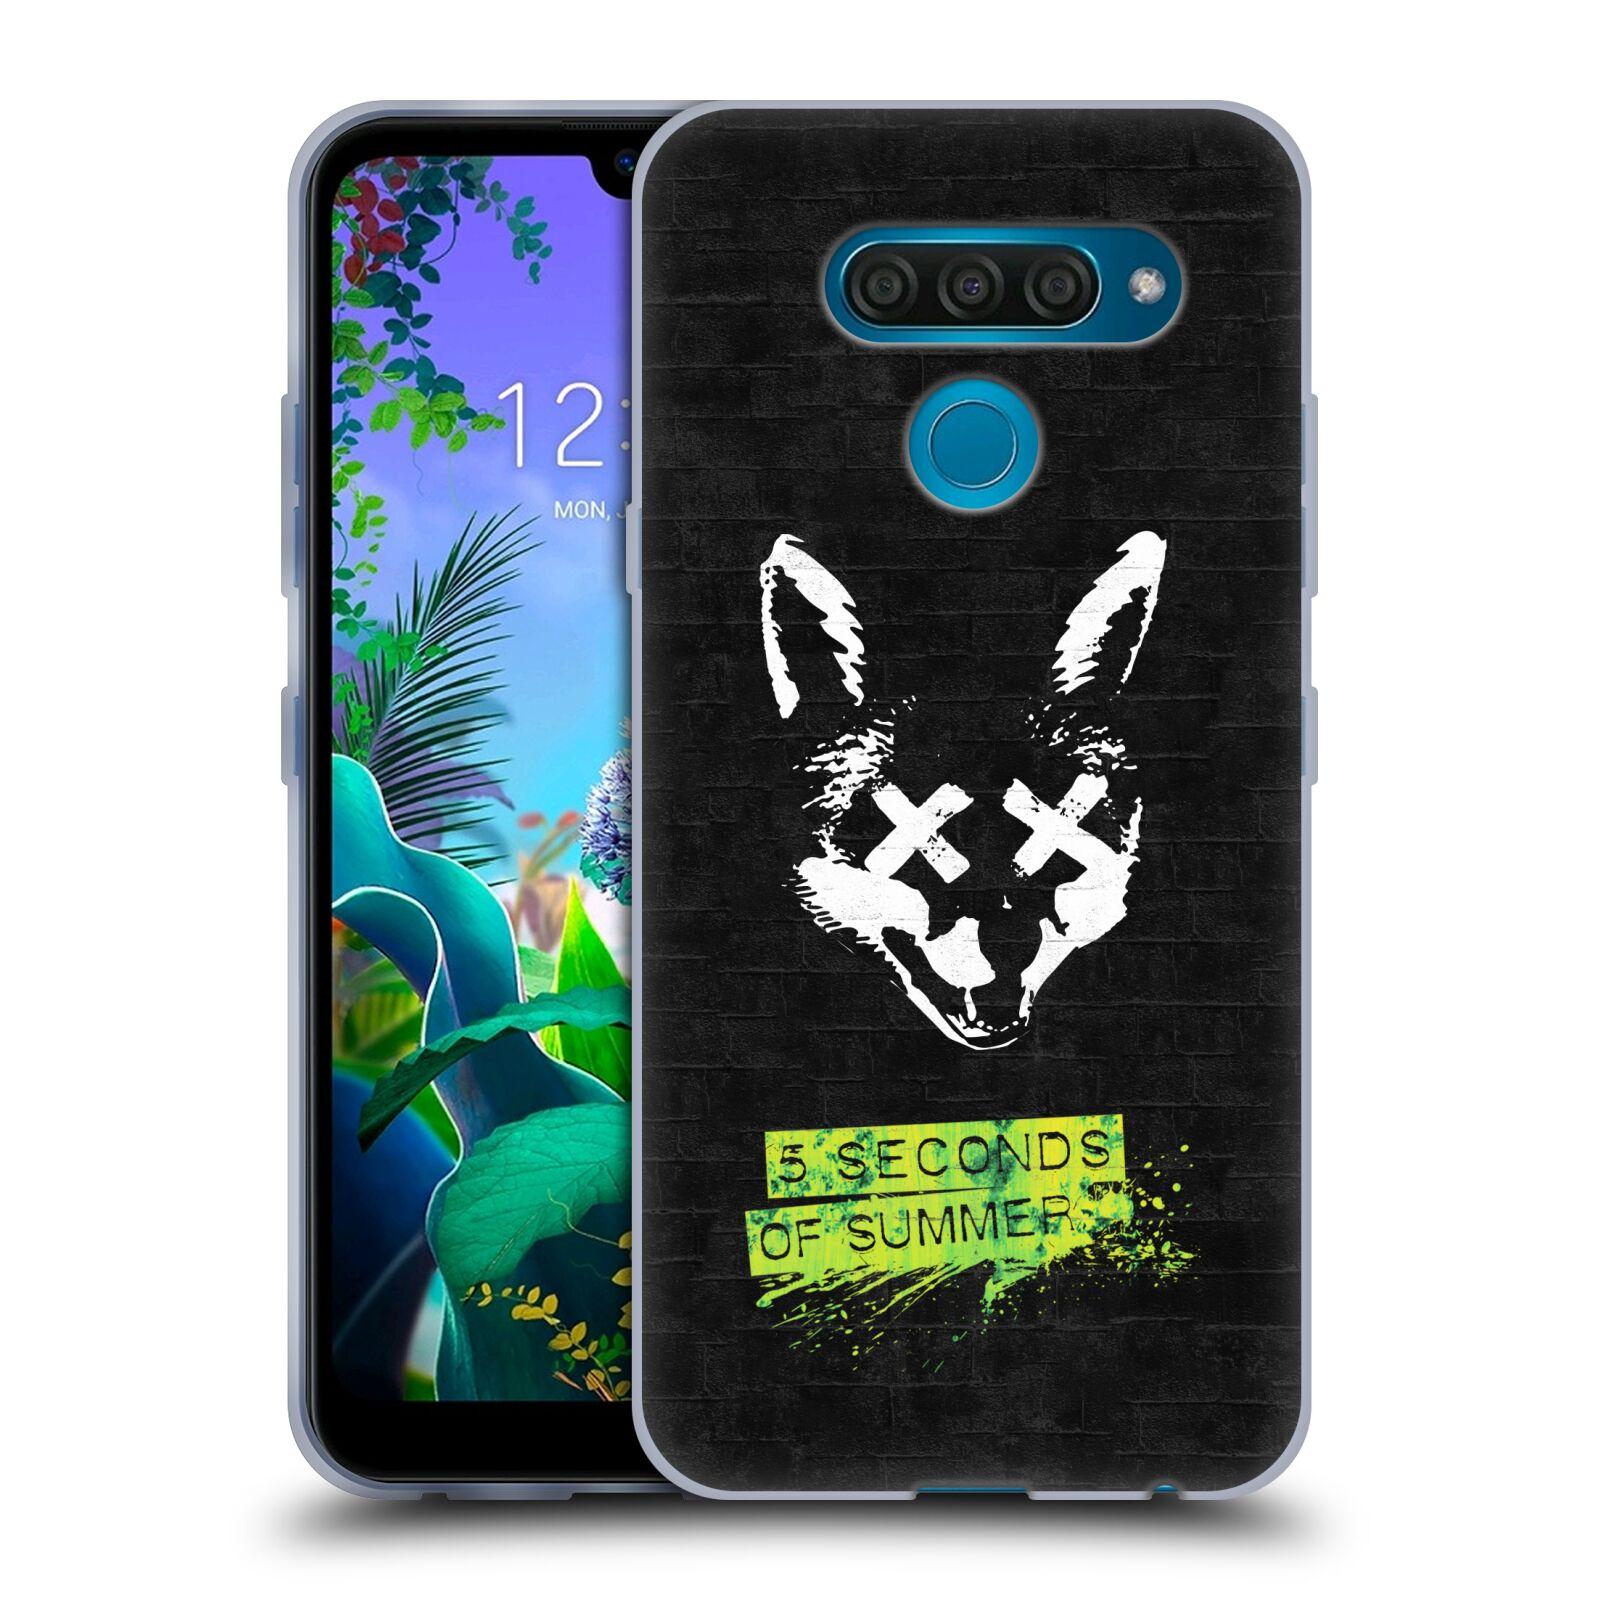 Silikonové pouzdro na mobil LG Q60 - Head Case - 5 Seconds of Summer - Fox